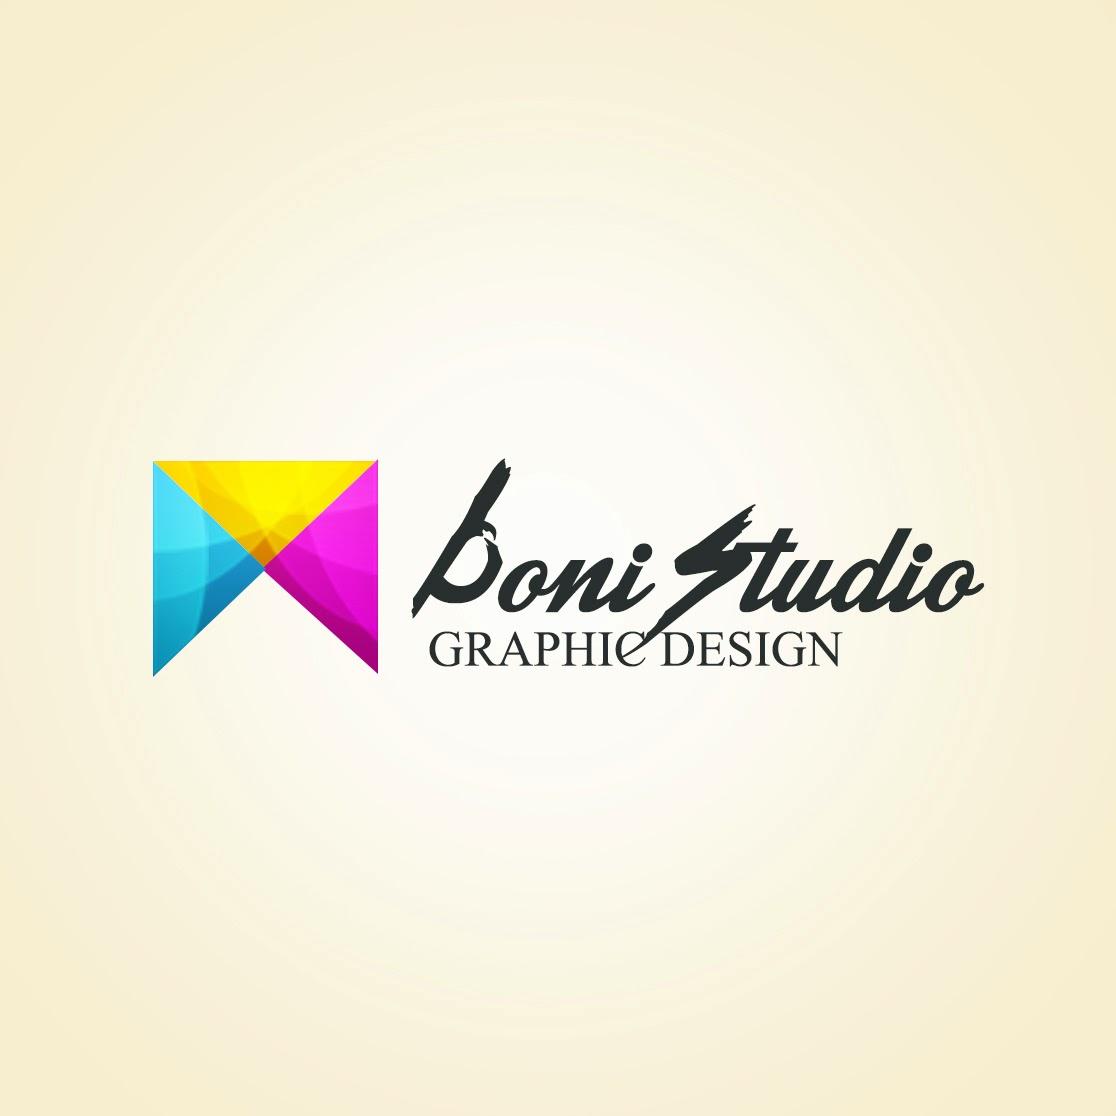 Jasa Desain Logo, Banner Buat Usaha Murah Berkualitas